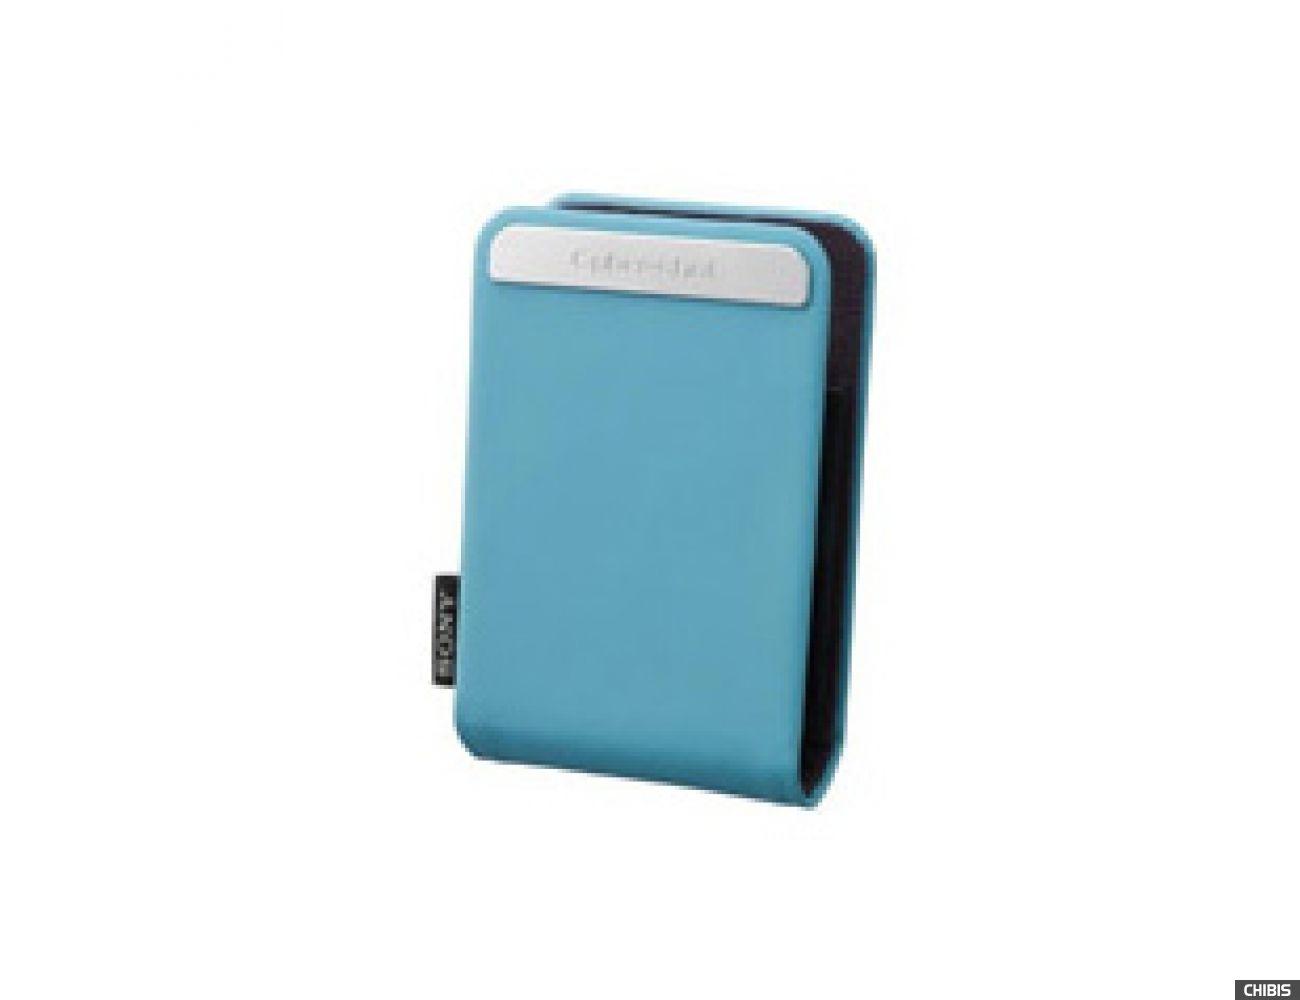 Чехол Sony DSC-W, S, T серии, мягкий, цвет Blue (LCS-TWGL)